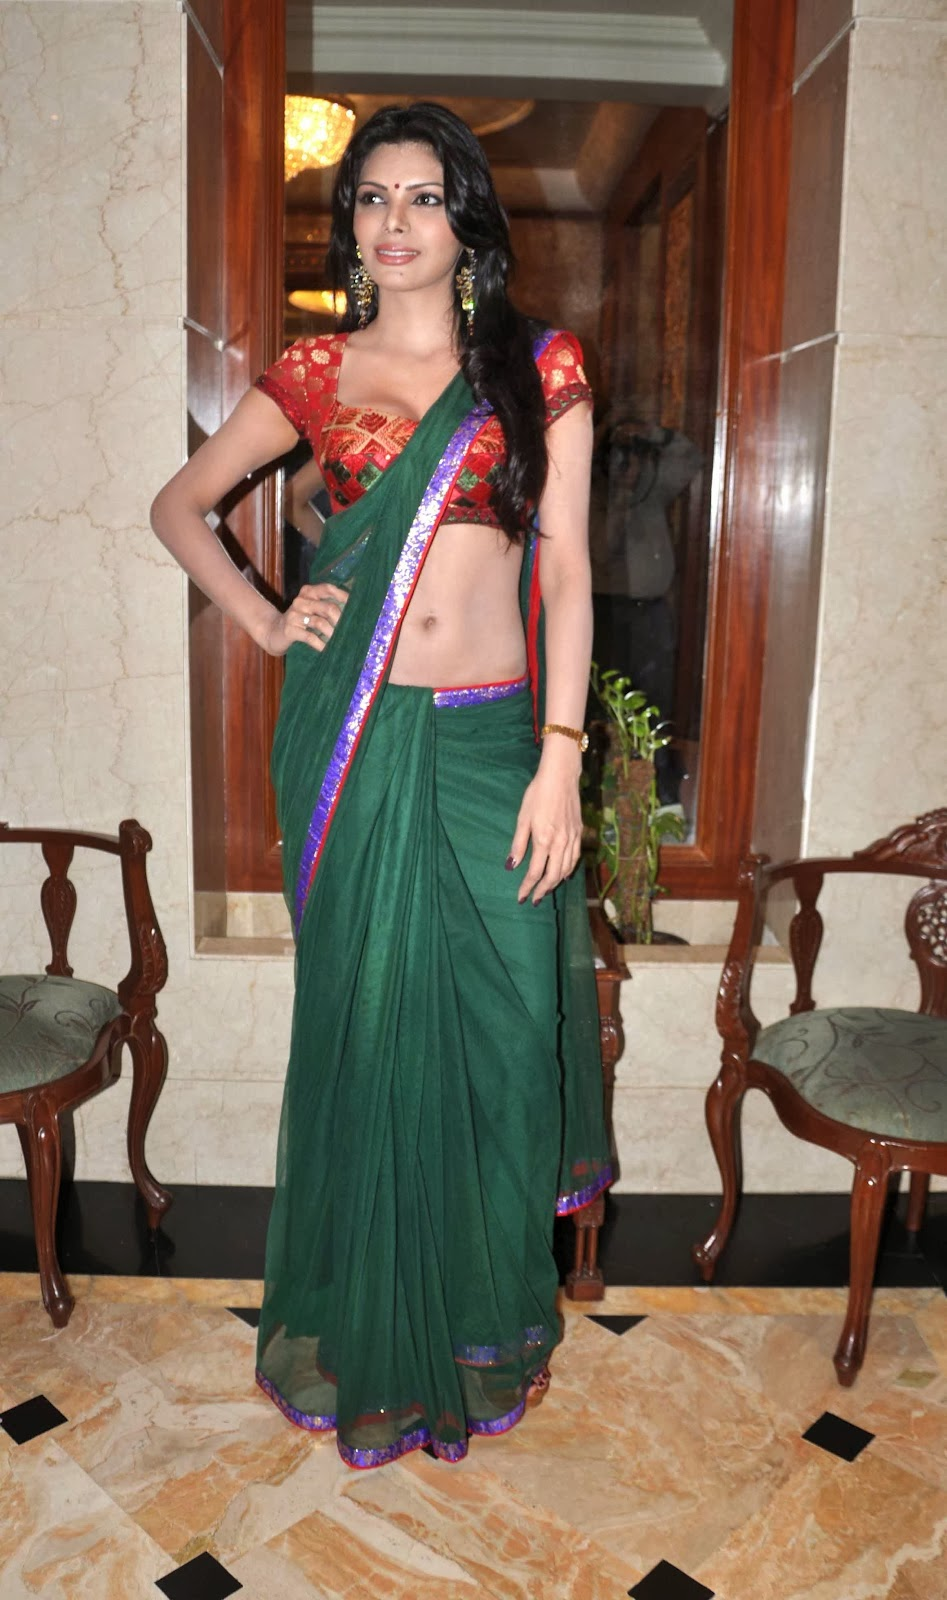 Watch Gunnjan Aras full movie - Real Bollywood. Hot scenes